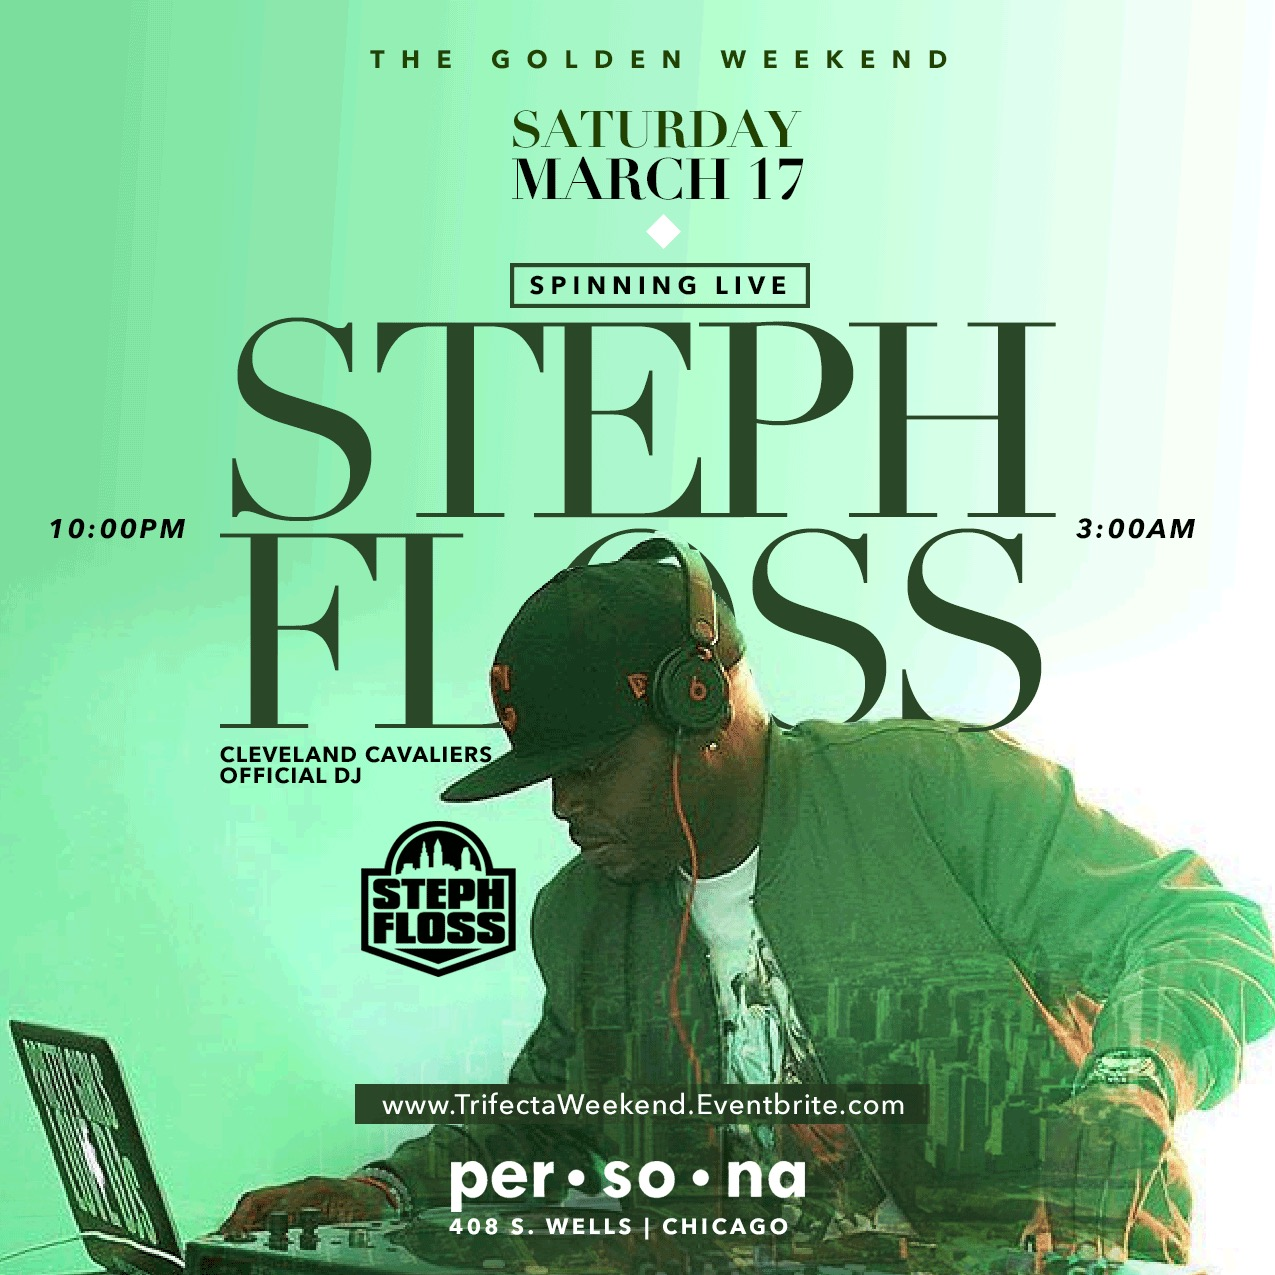 STEPH FLOSS